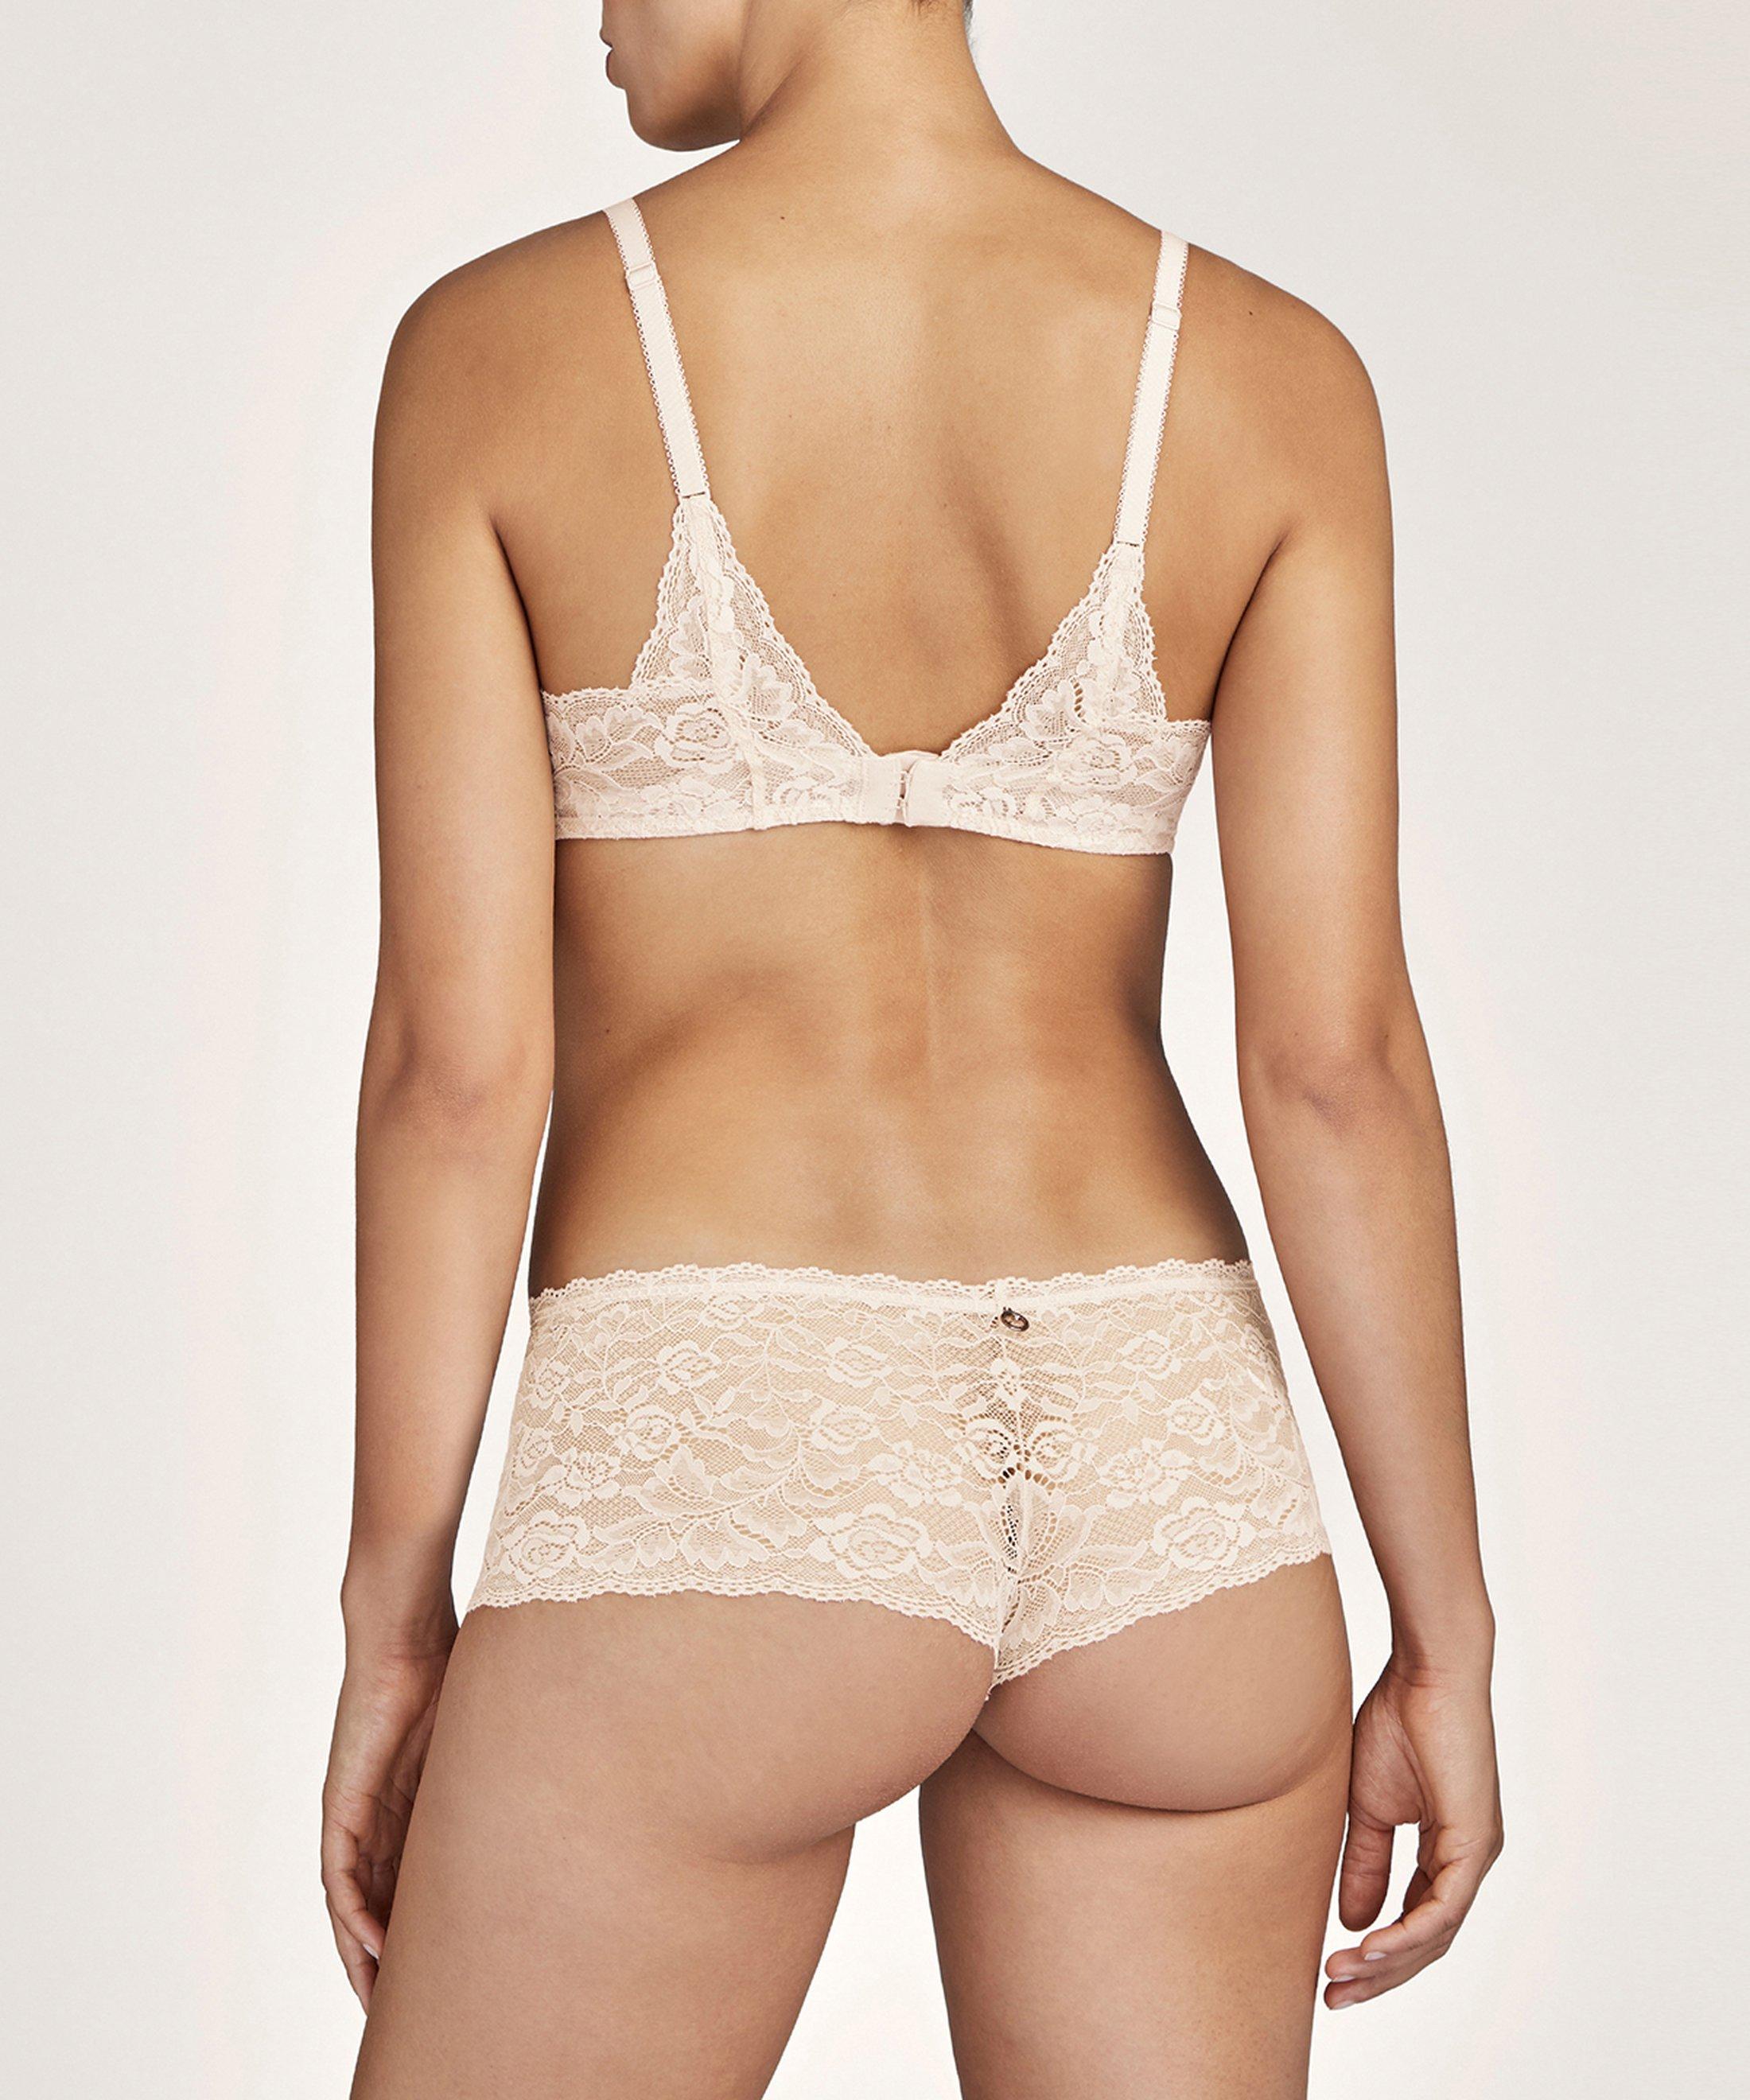 ROSESSENCE Scarf push-up bra Nude d'Été | Aubade